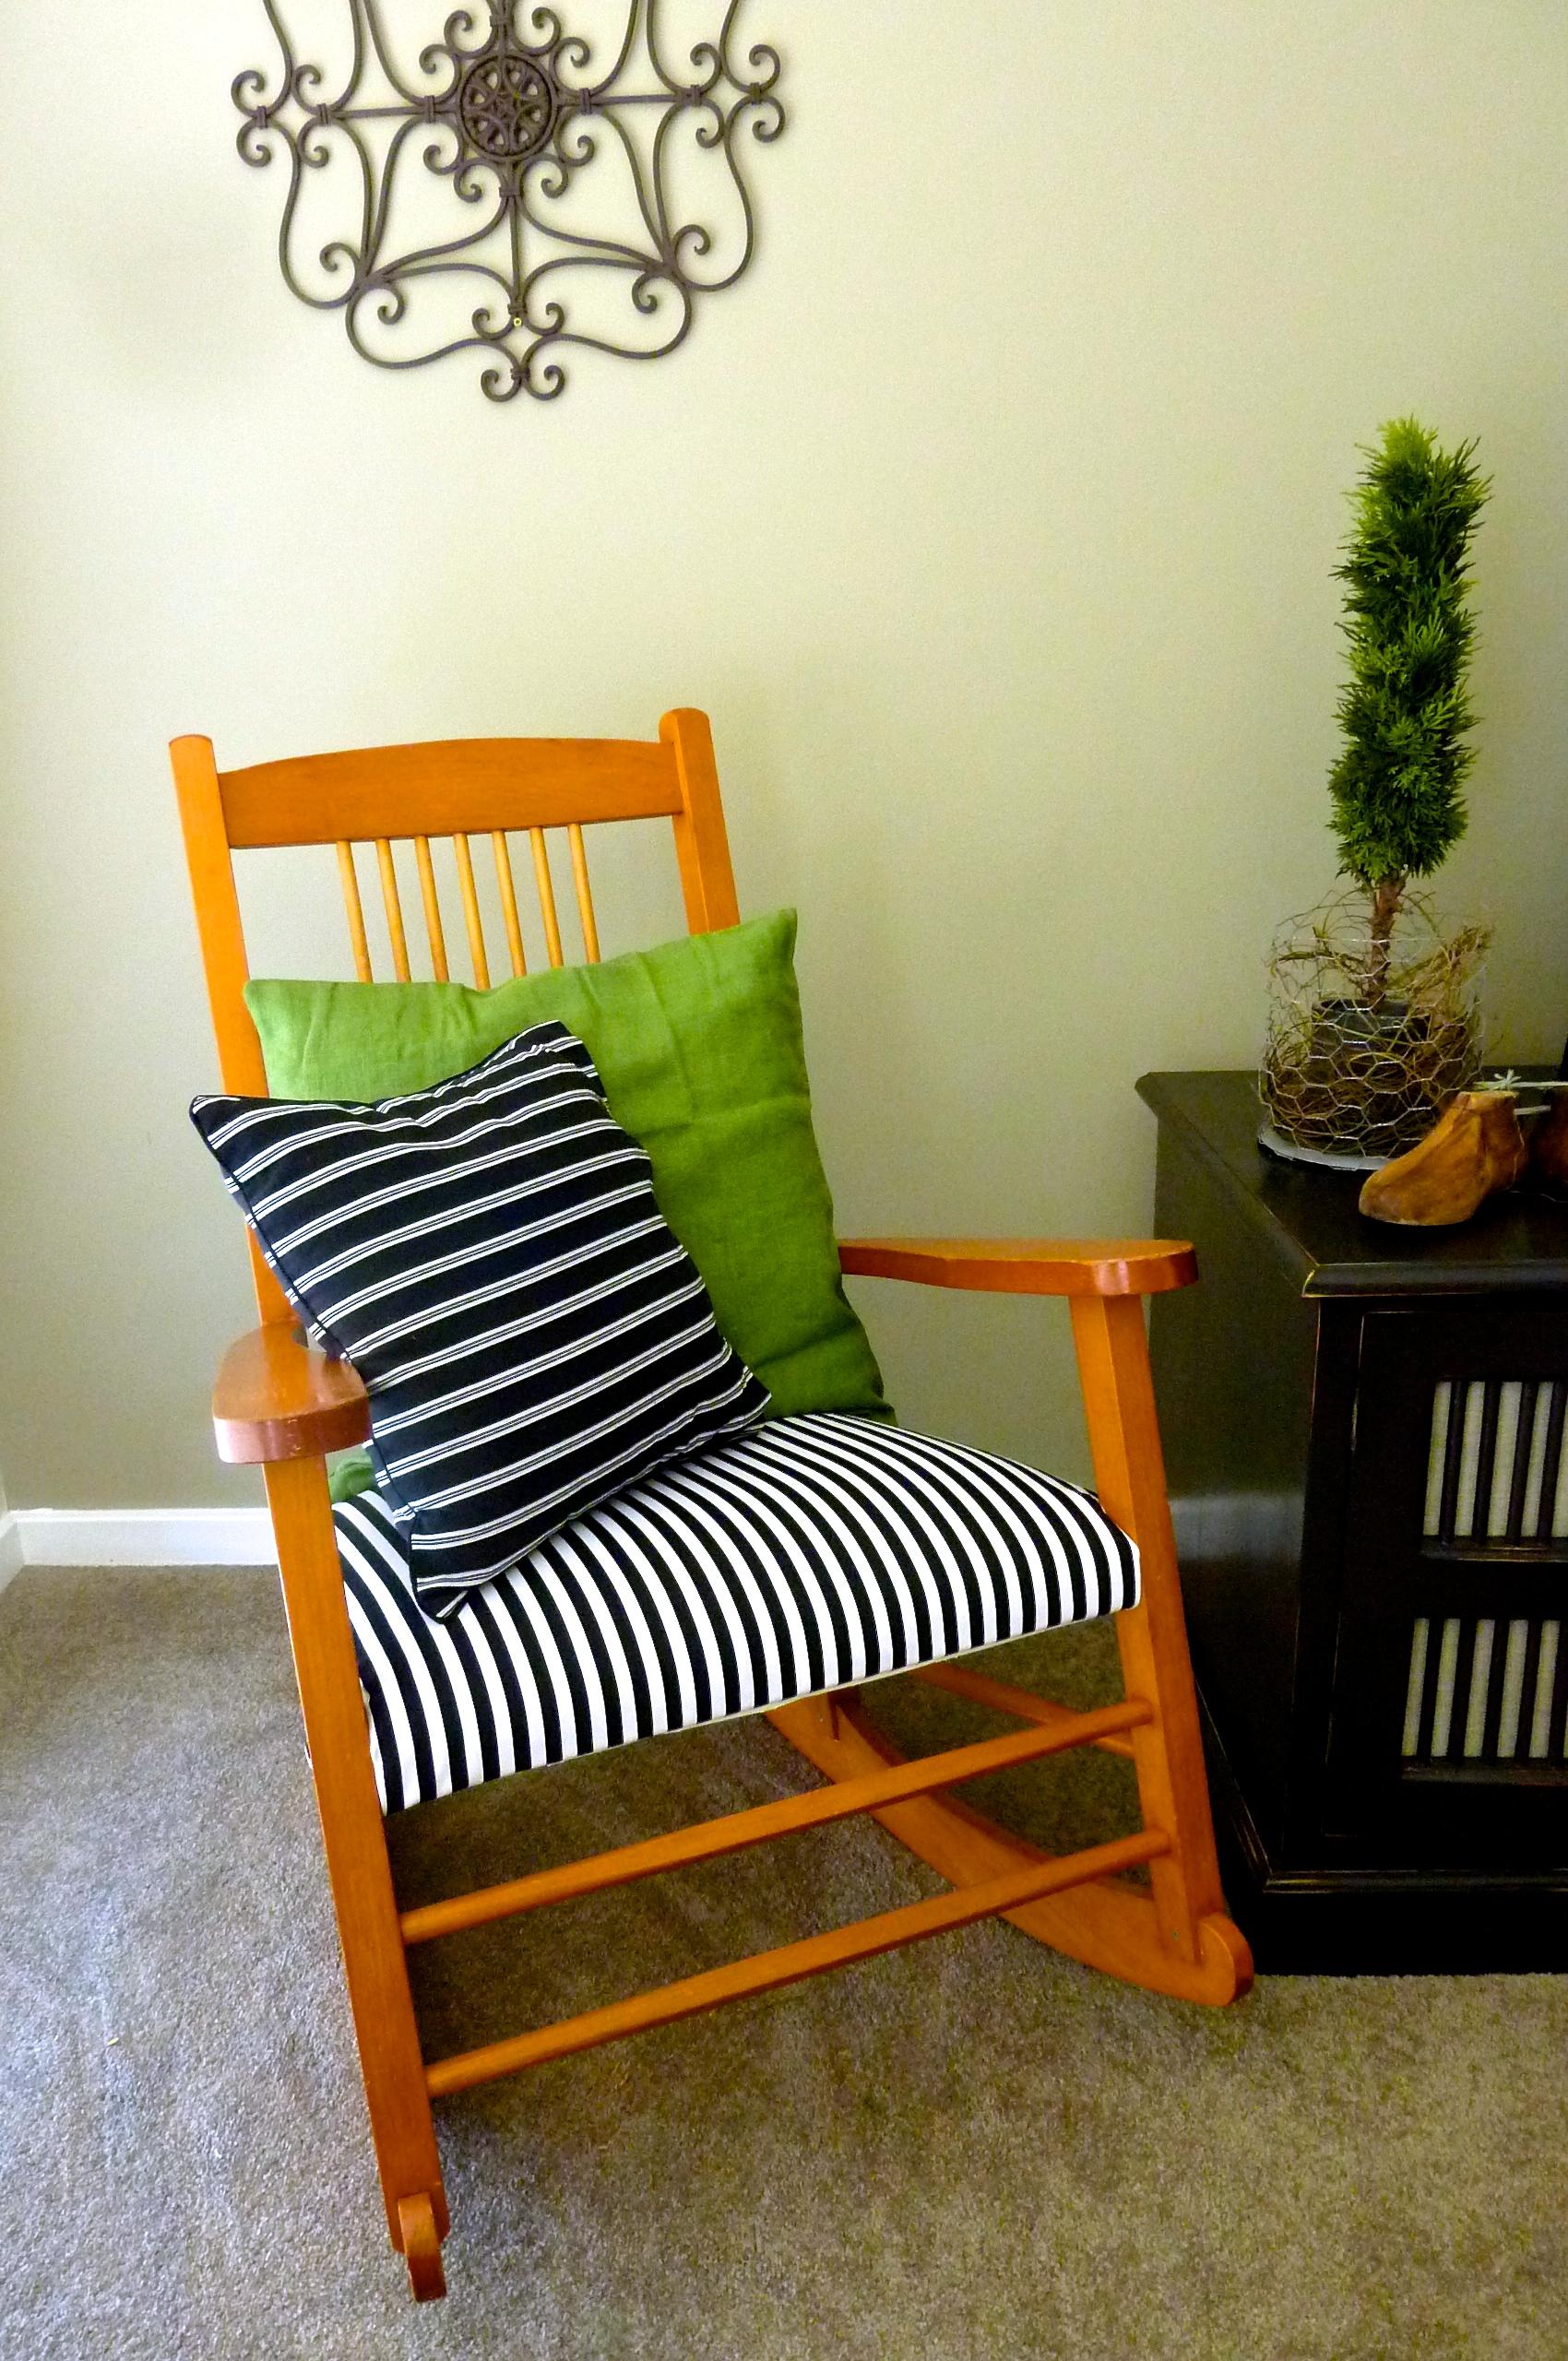 grandma rocking chair staples hardwood floor mat get outta yer